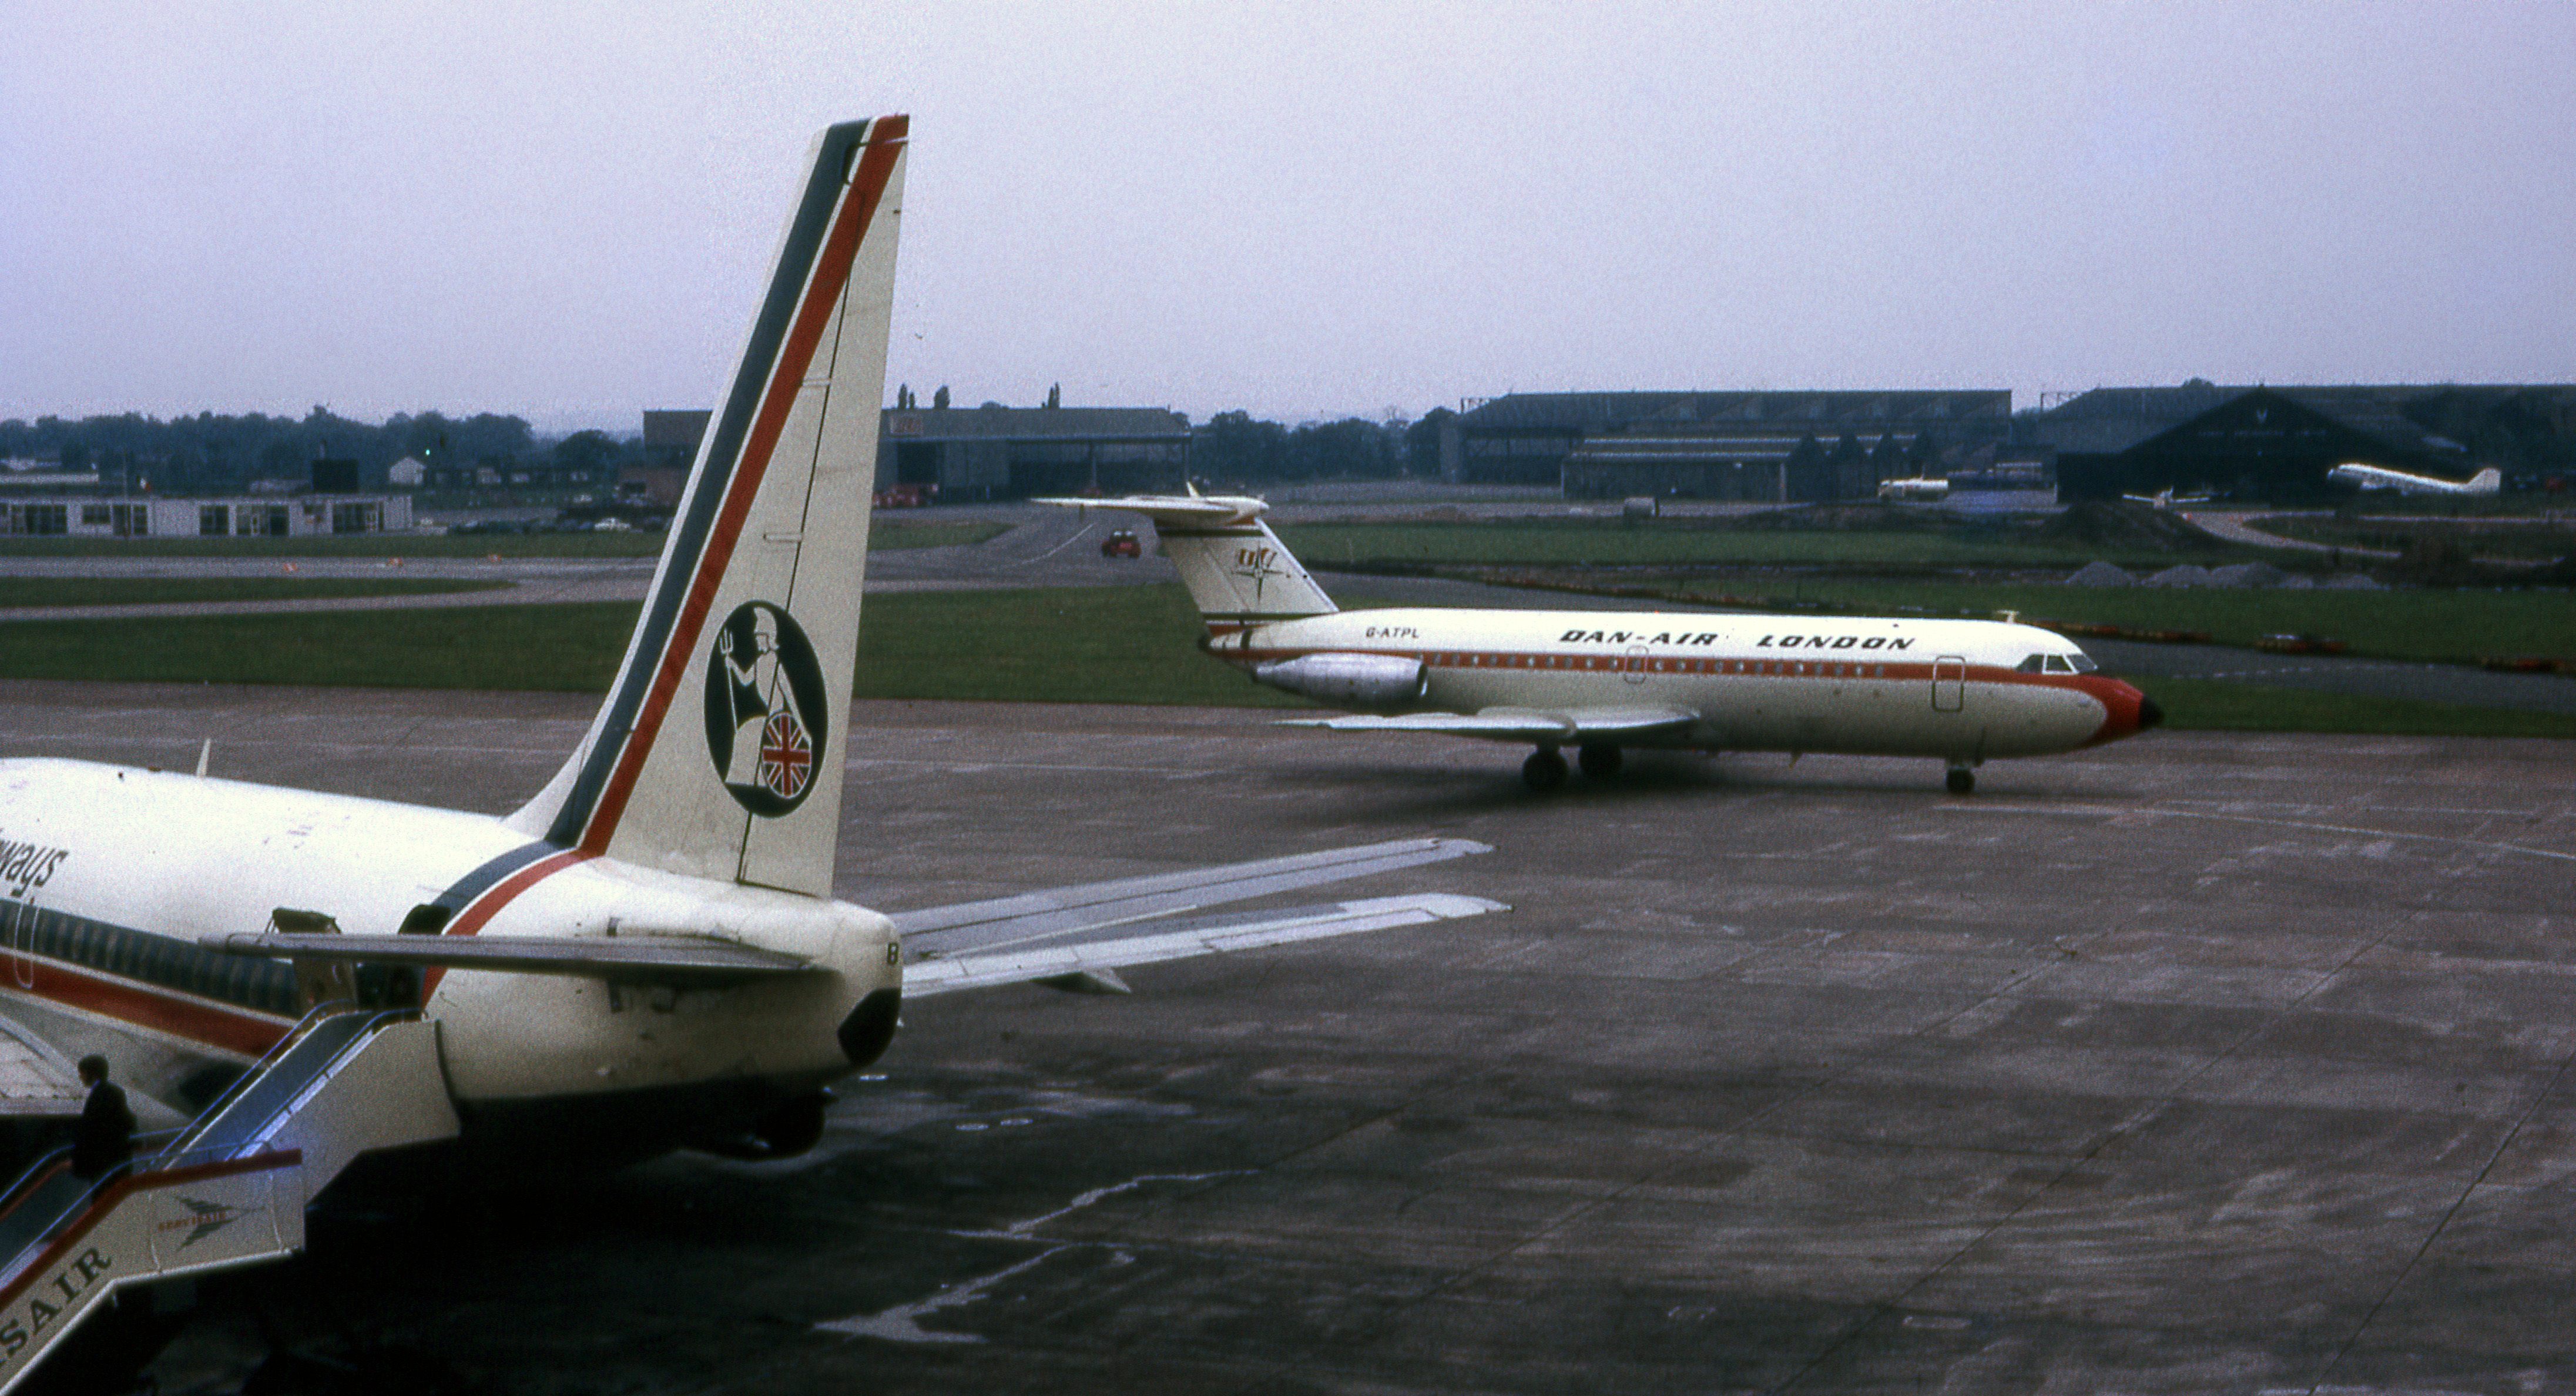 Airports England Airport England 1972.jpg